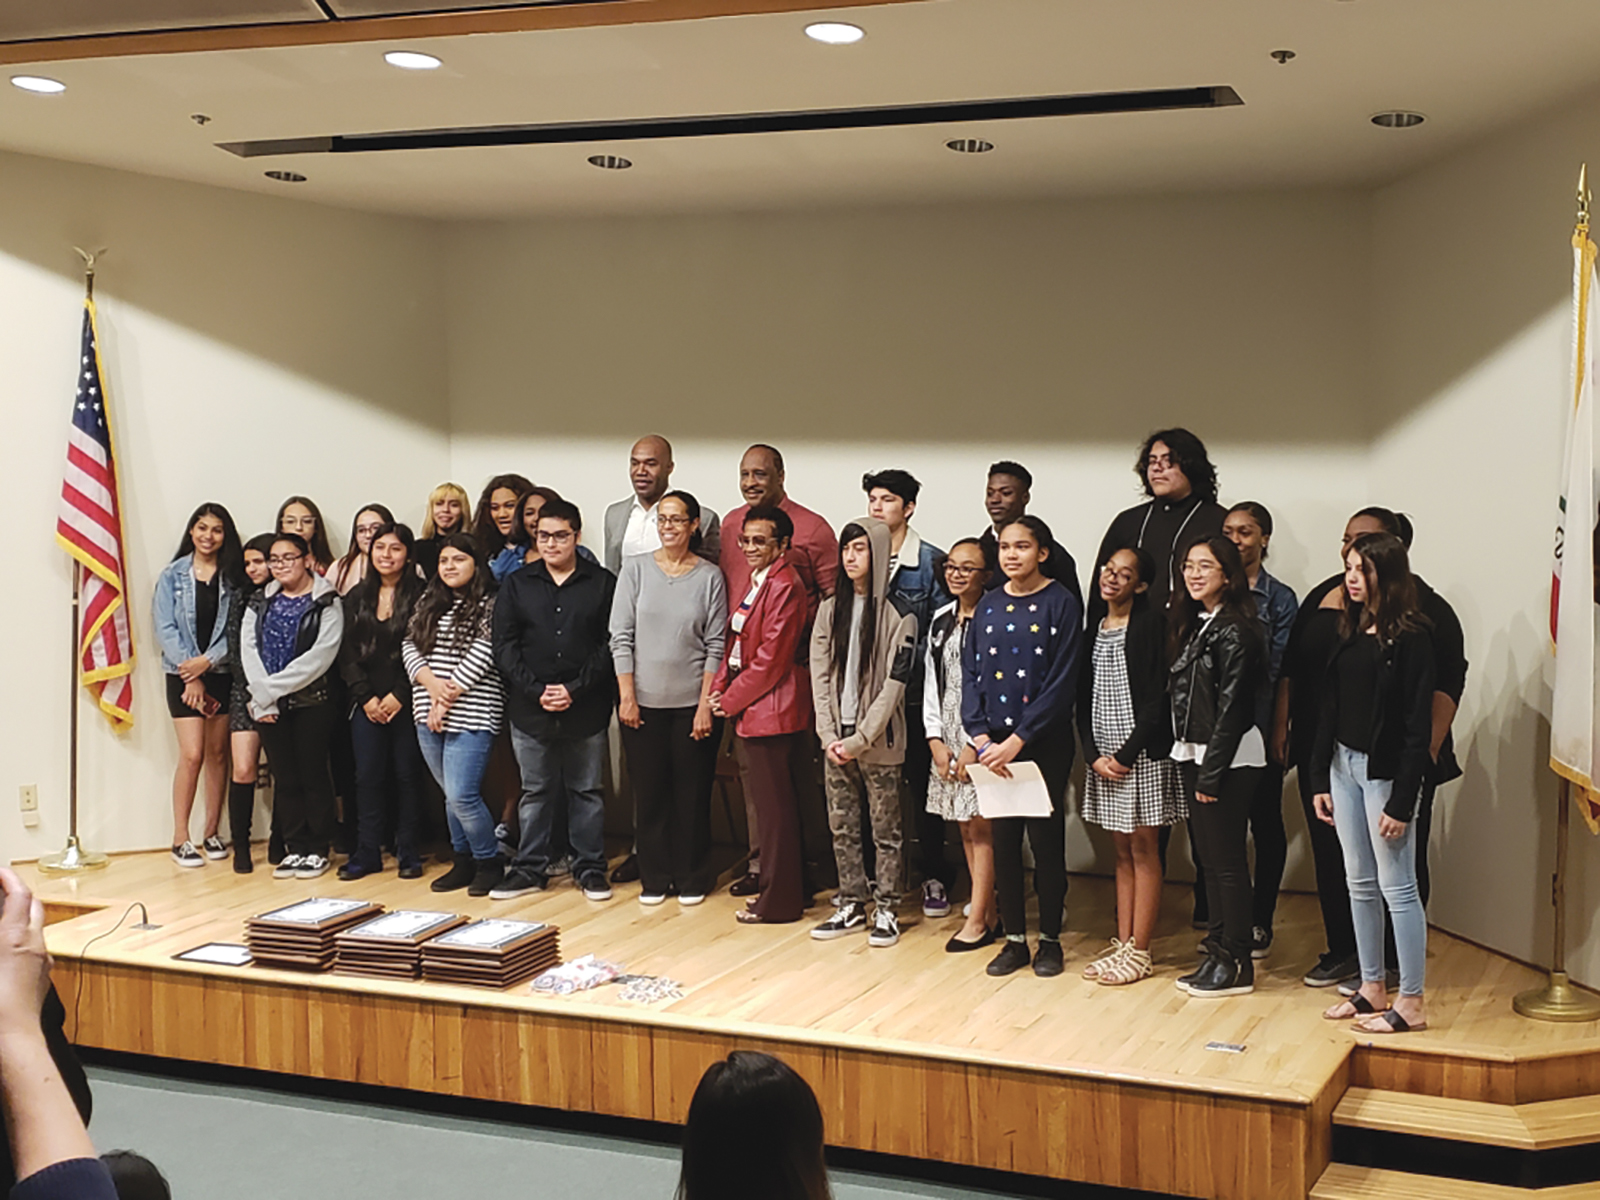 2018 City Treasurer Student Academy Program pic 2.jpg